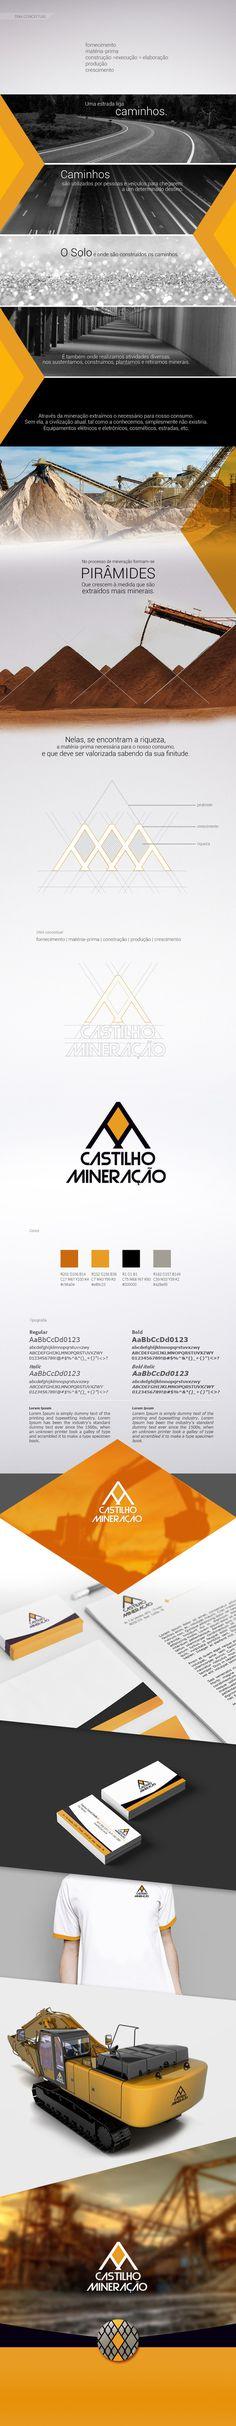 Castilho Mineração - marianapoczapski #logo #identity #construction